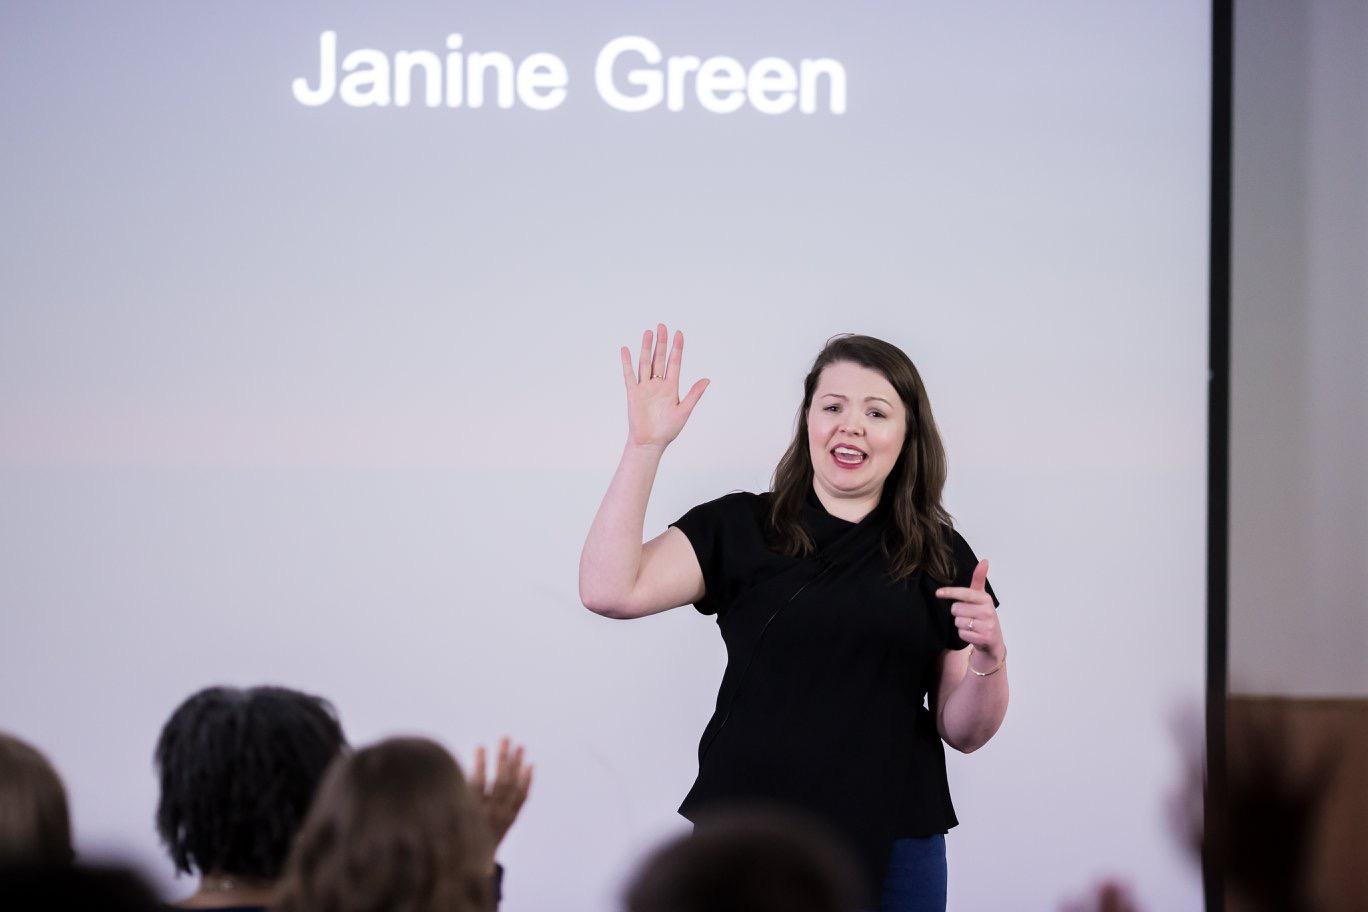 Janine Green